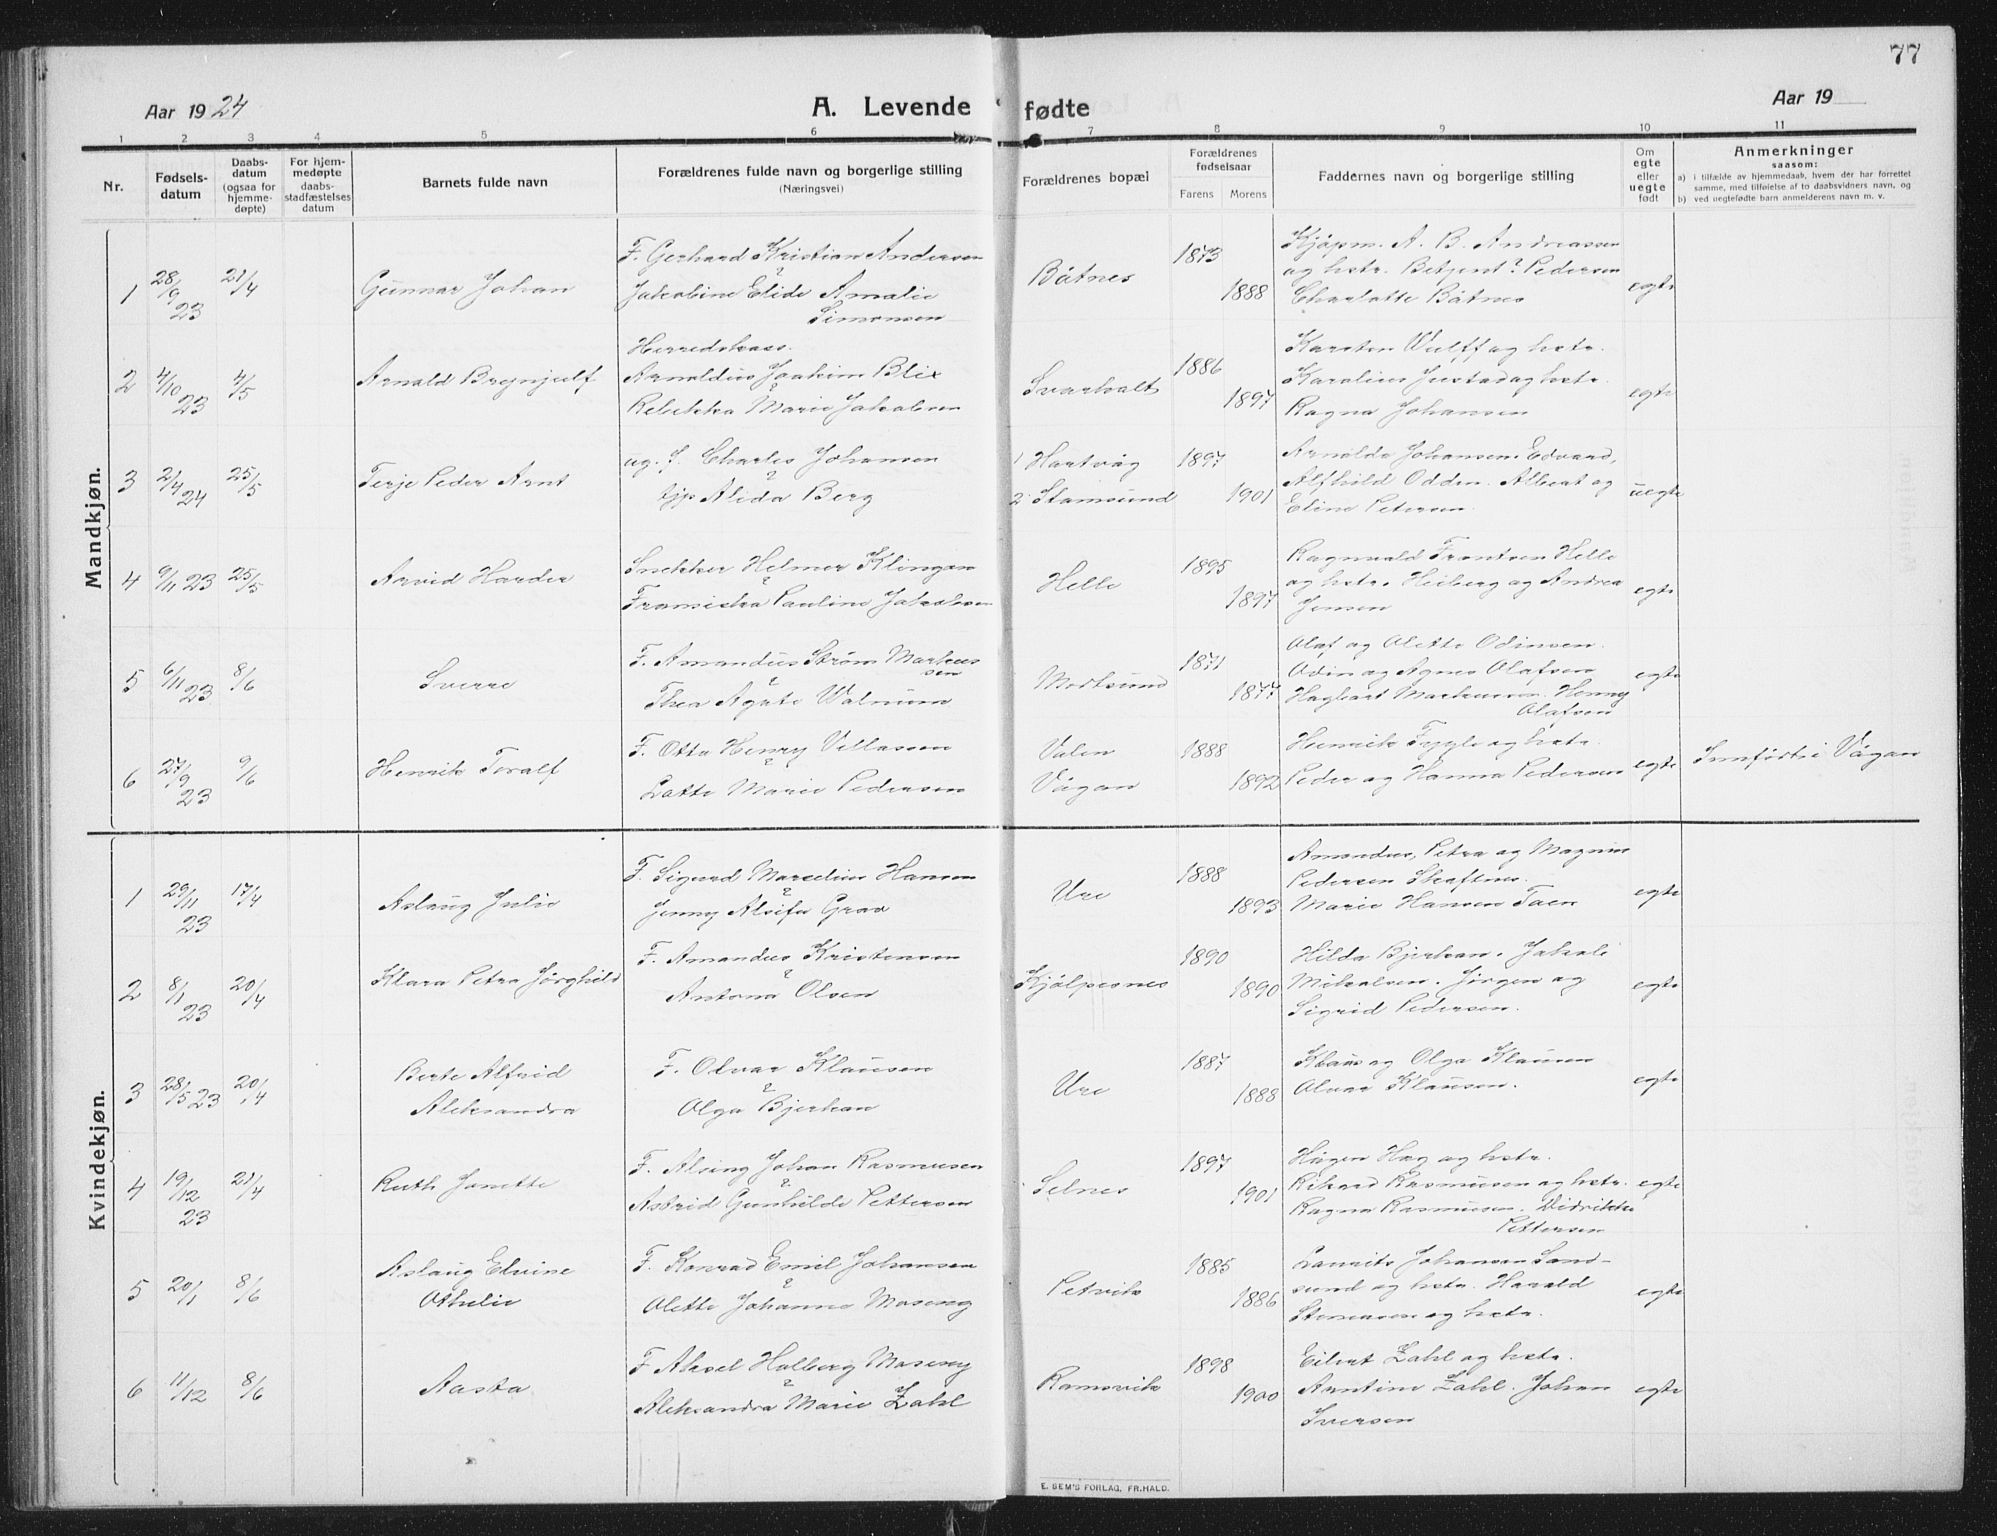 SAT, Ministerialprotokoller, klokkerbøker og fødselsregistre - Nordland, 882/L1183: Klokkerbok nr. 882C01, 1911-1938, s. 77